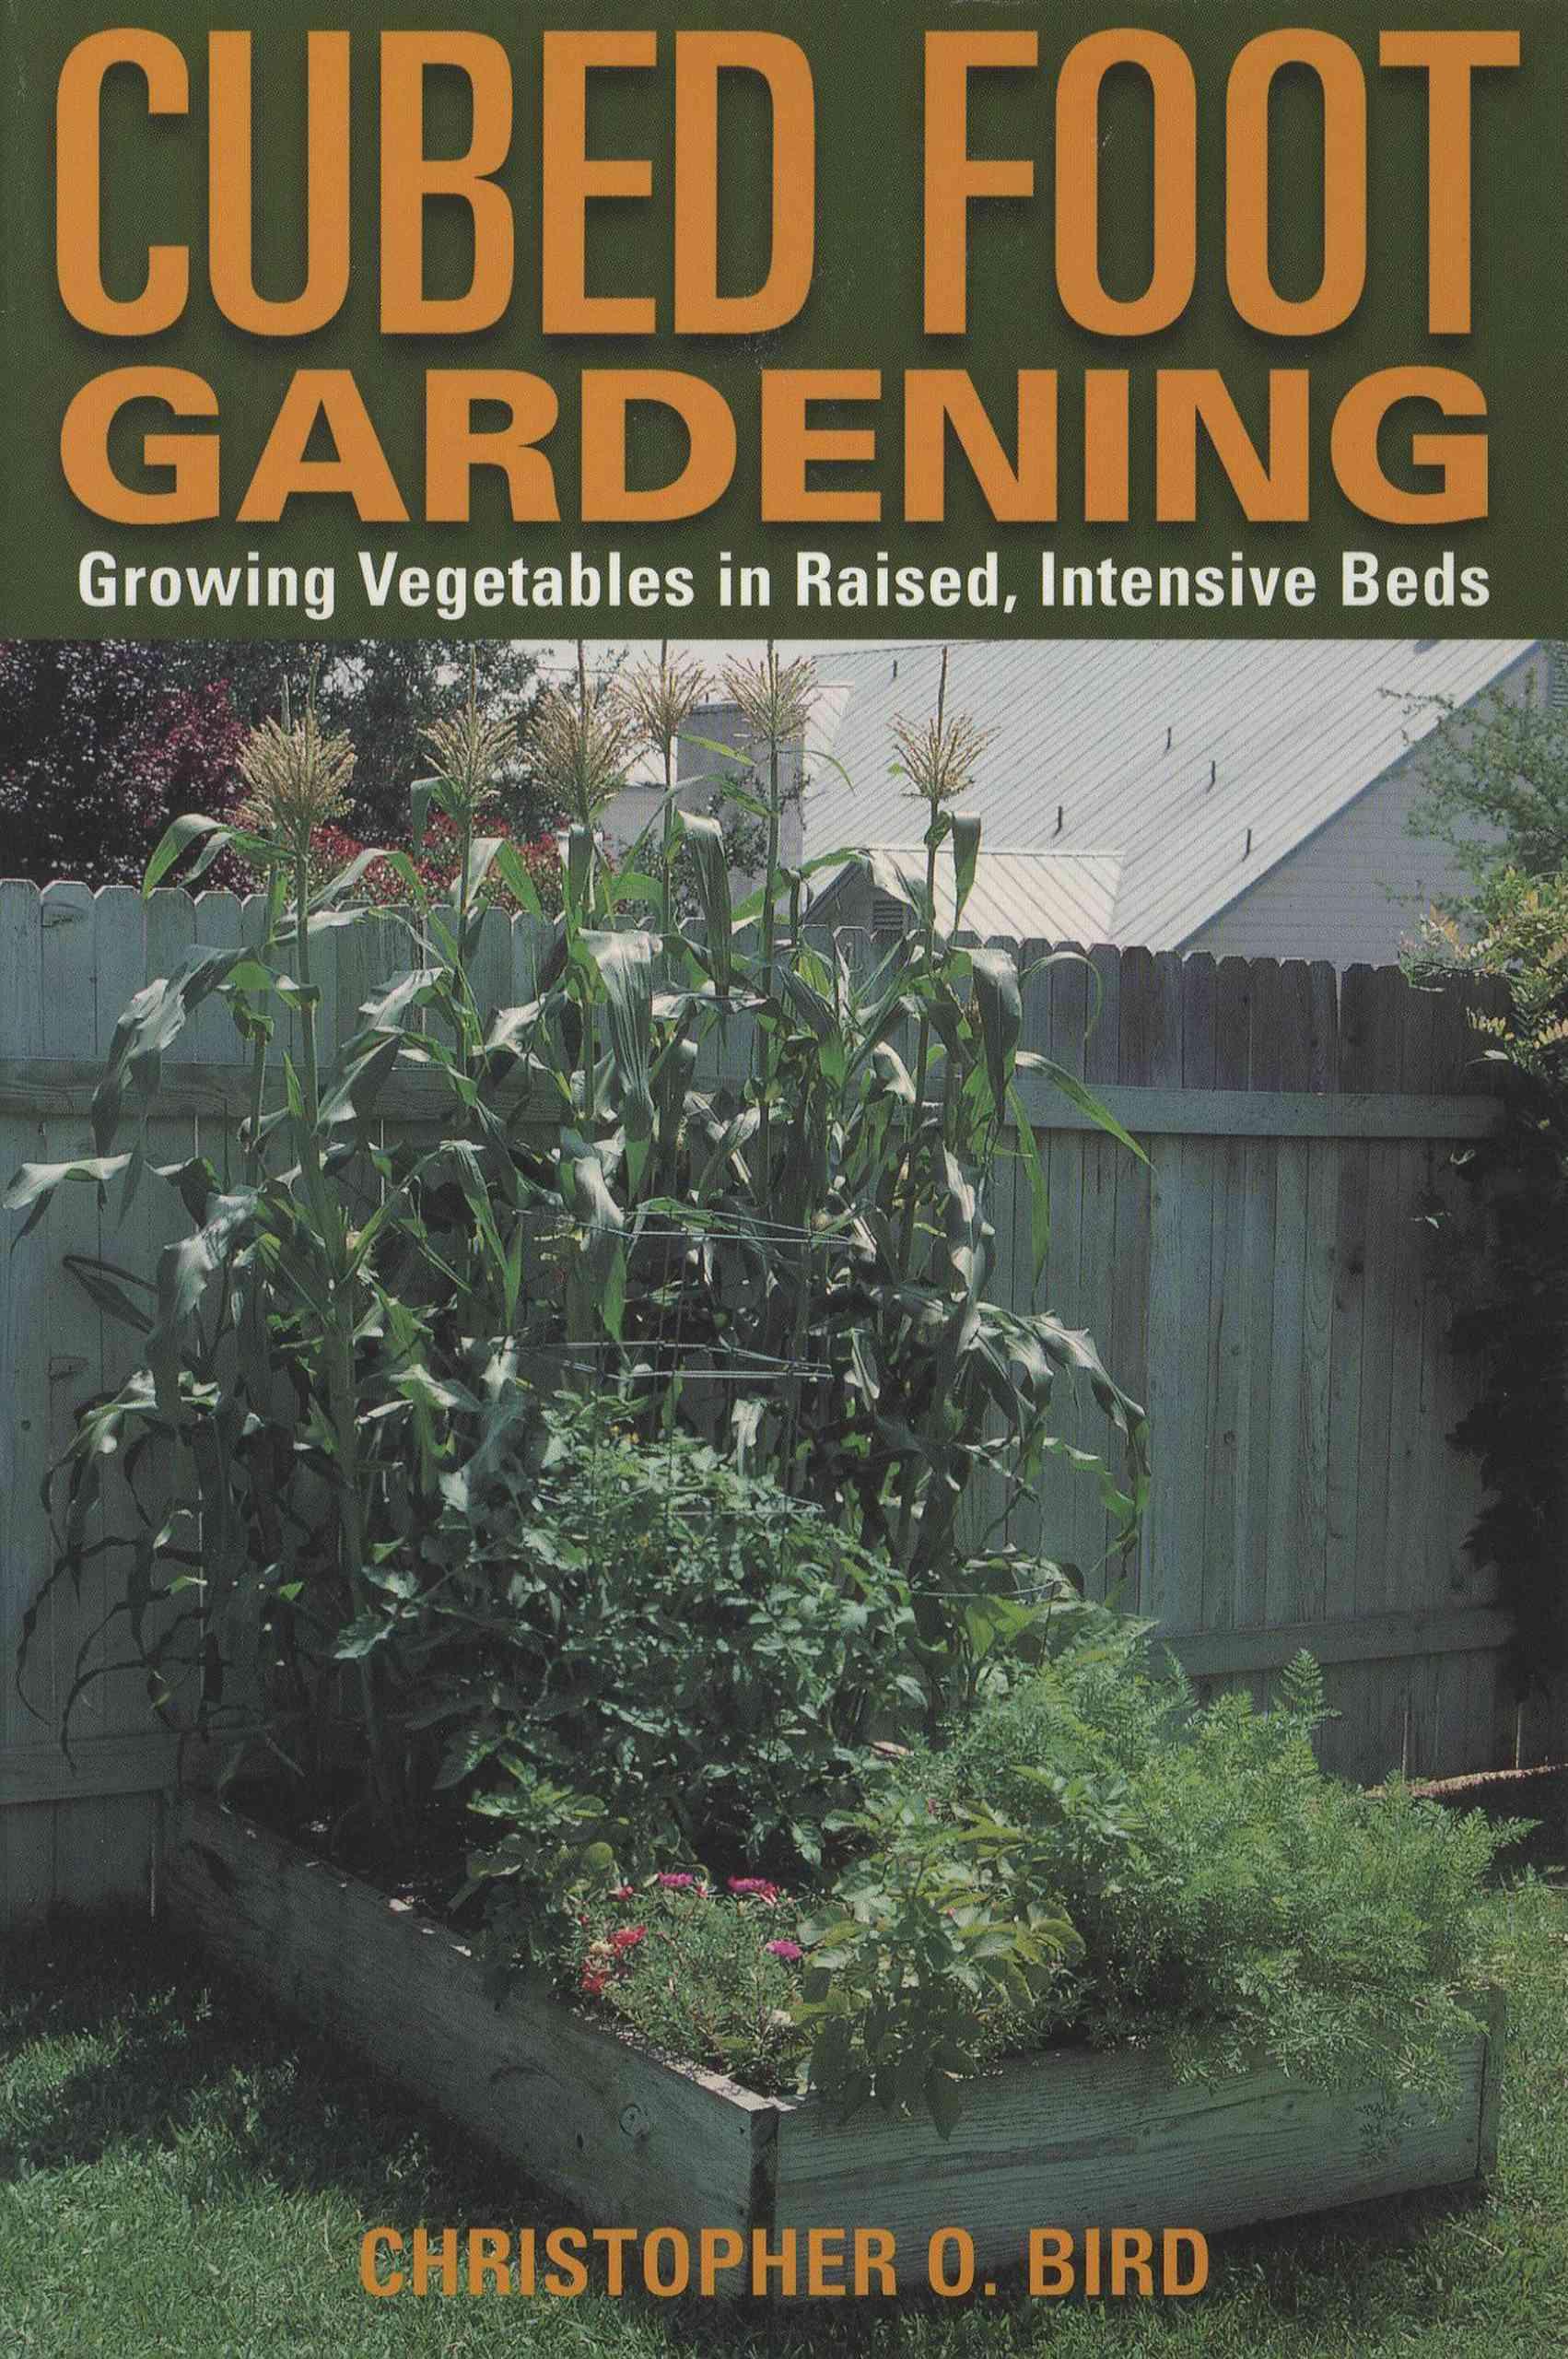 Cubed Foot Gardening: Growing Vegetables in Raised, Intensive Beds (Paperback)